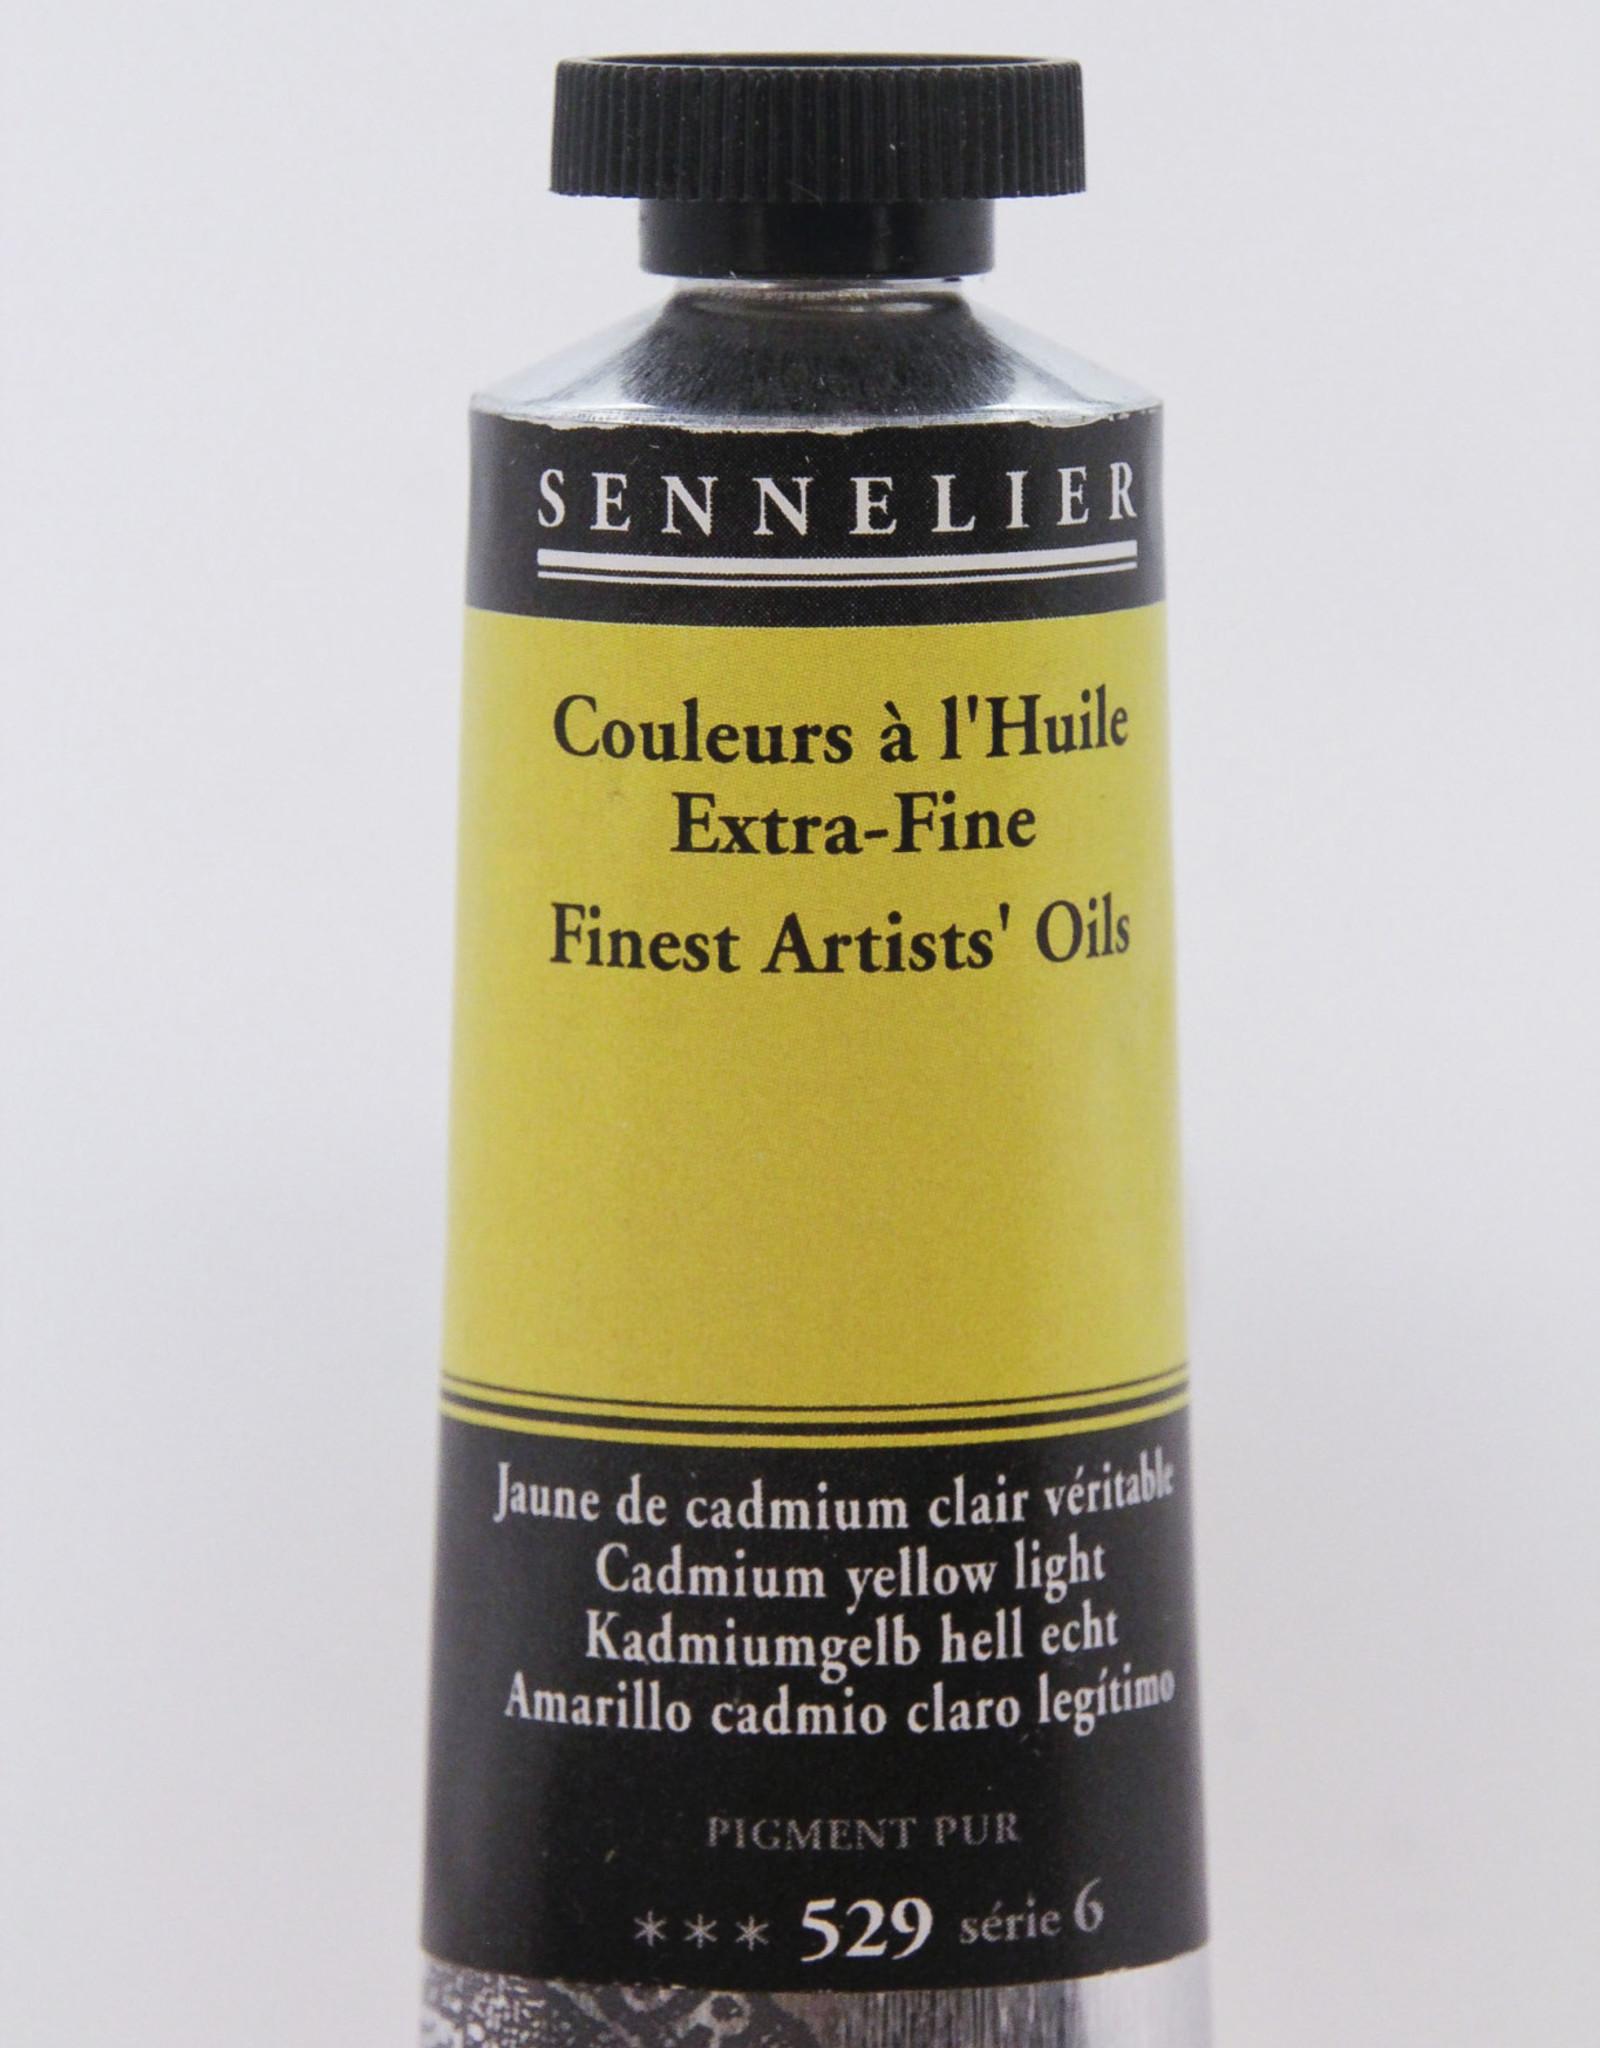 Sennelier, Fine Artists' Oil Paint, Cadmium Yellow Light, 529, 40ml Tube, Series 6